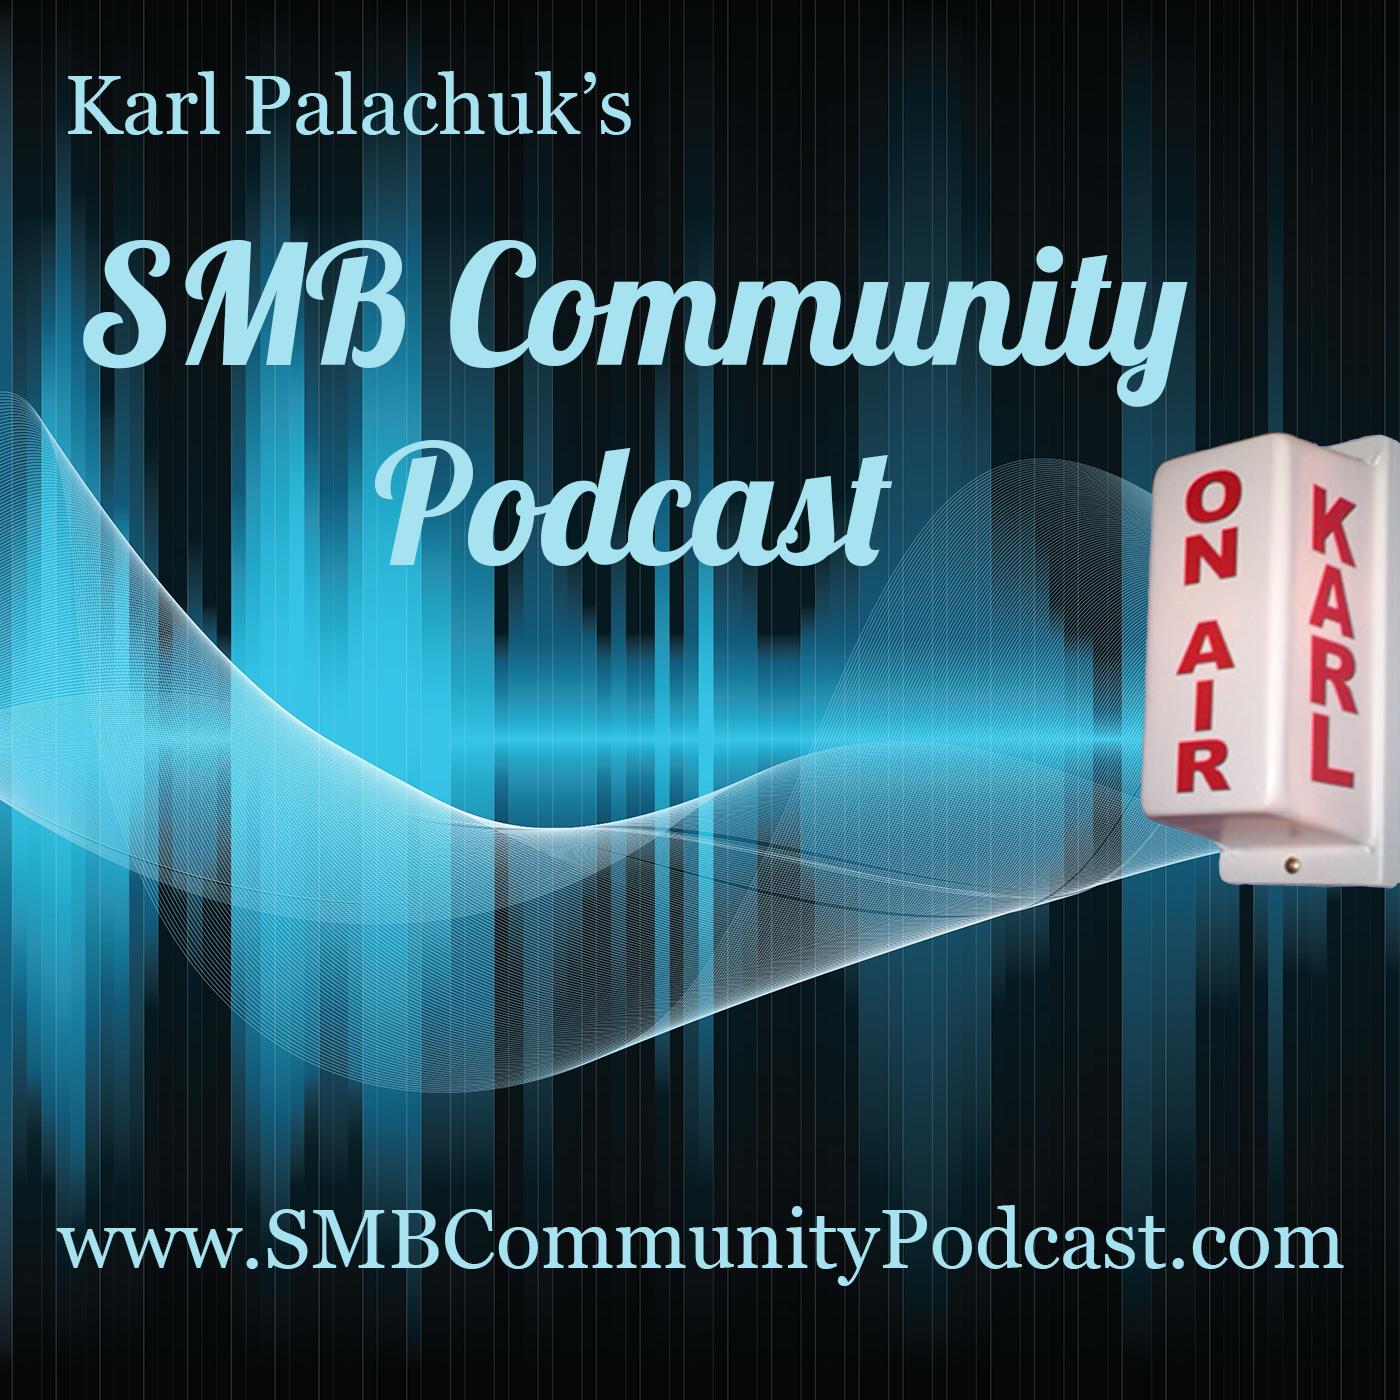 Paul Greens MSP Marketing Podcast